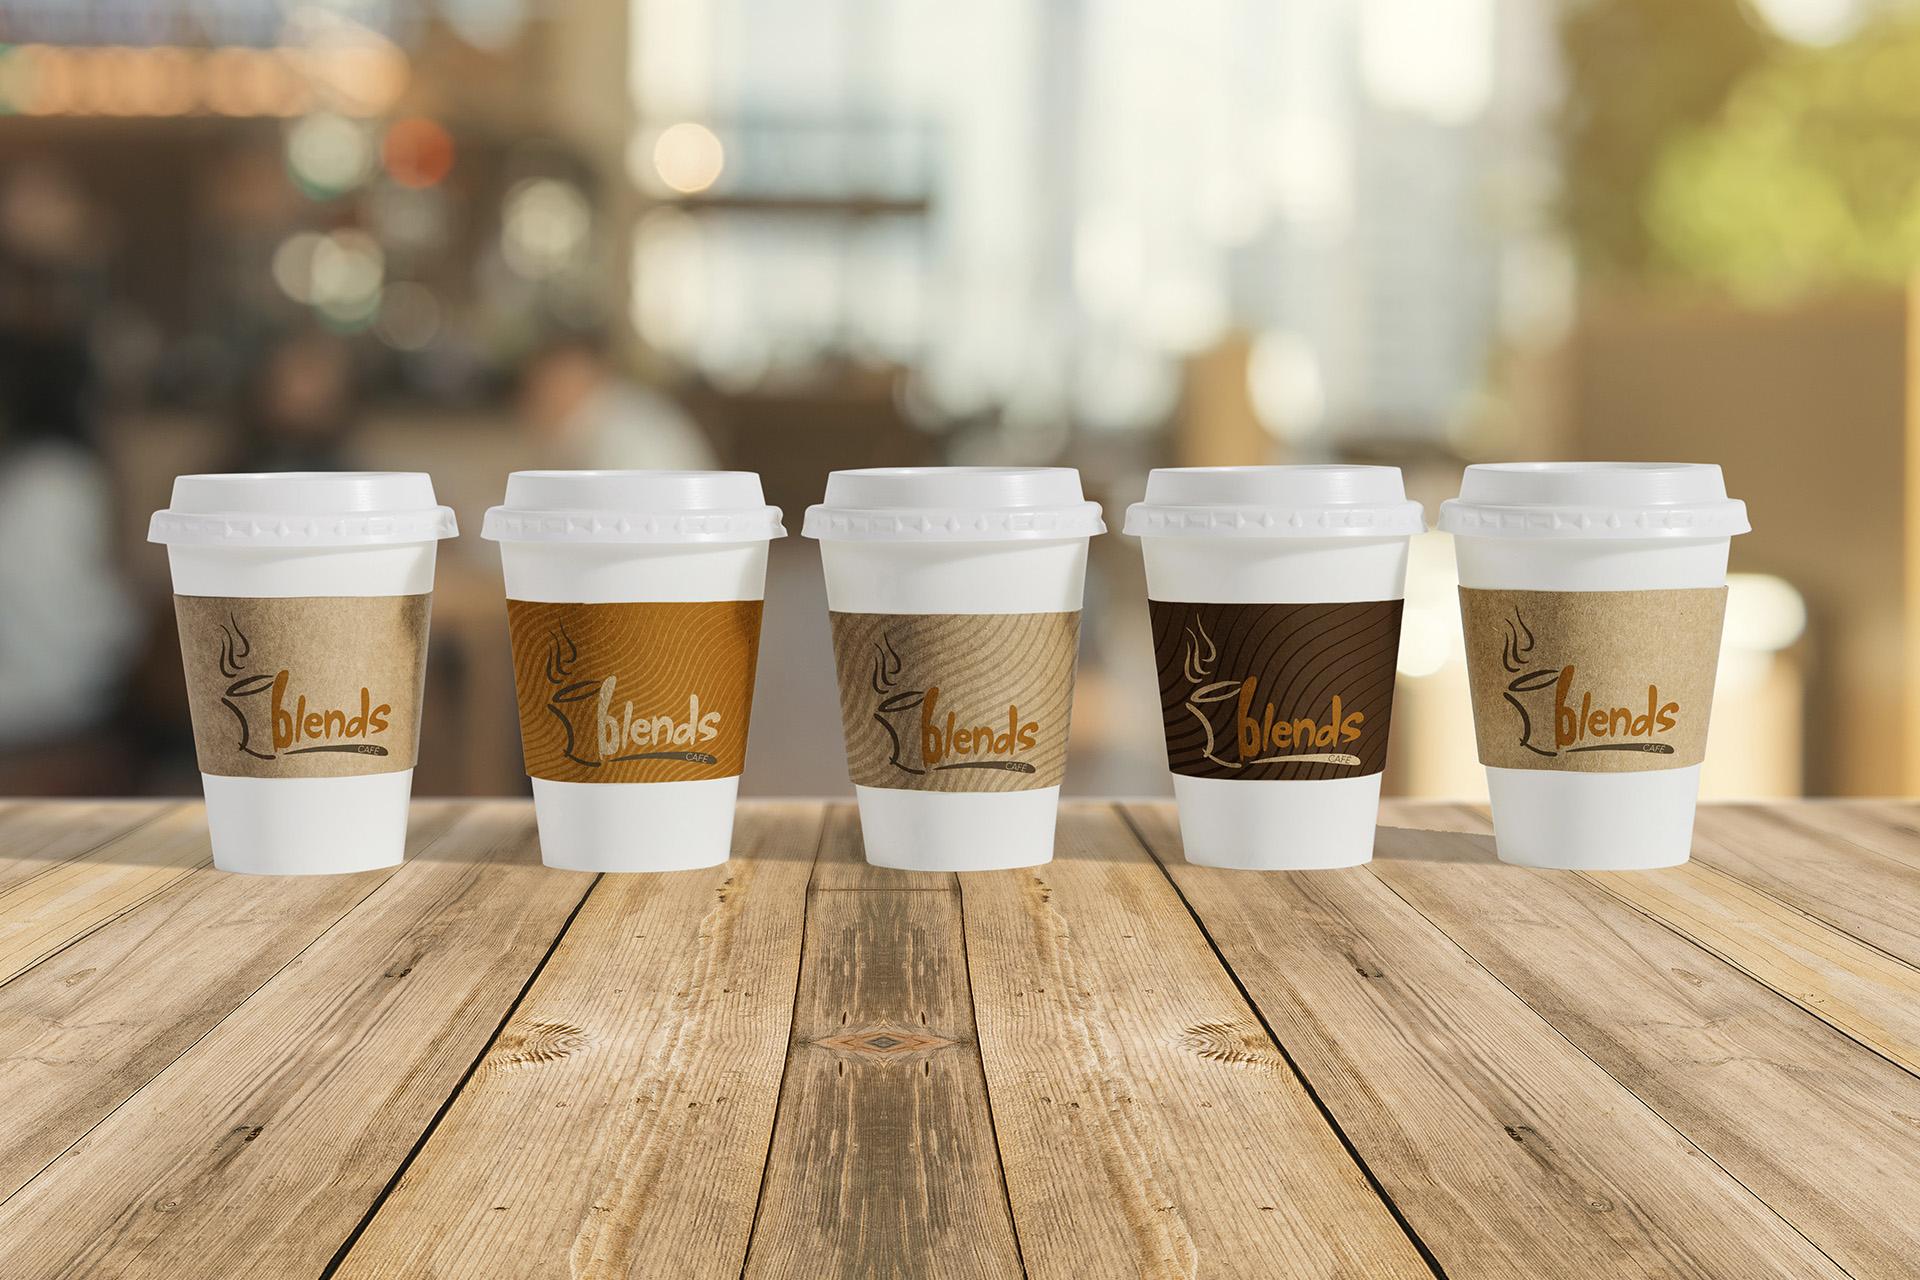 Blends Cafe cups